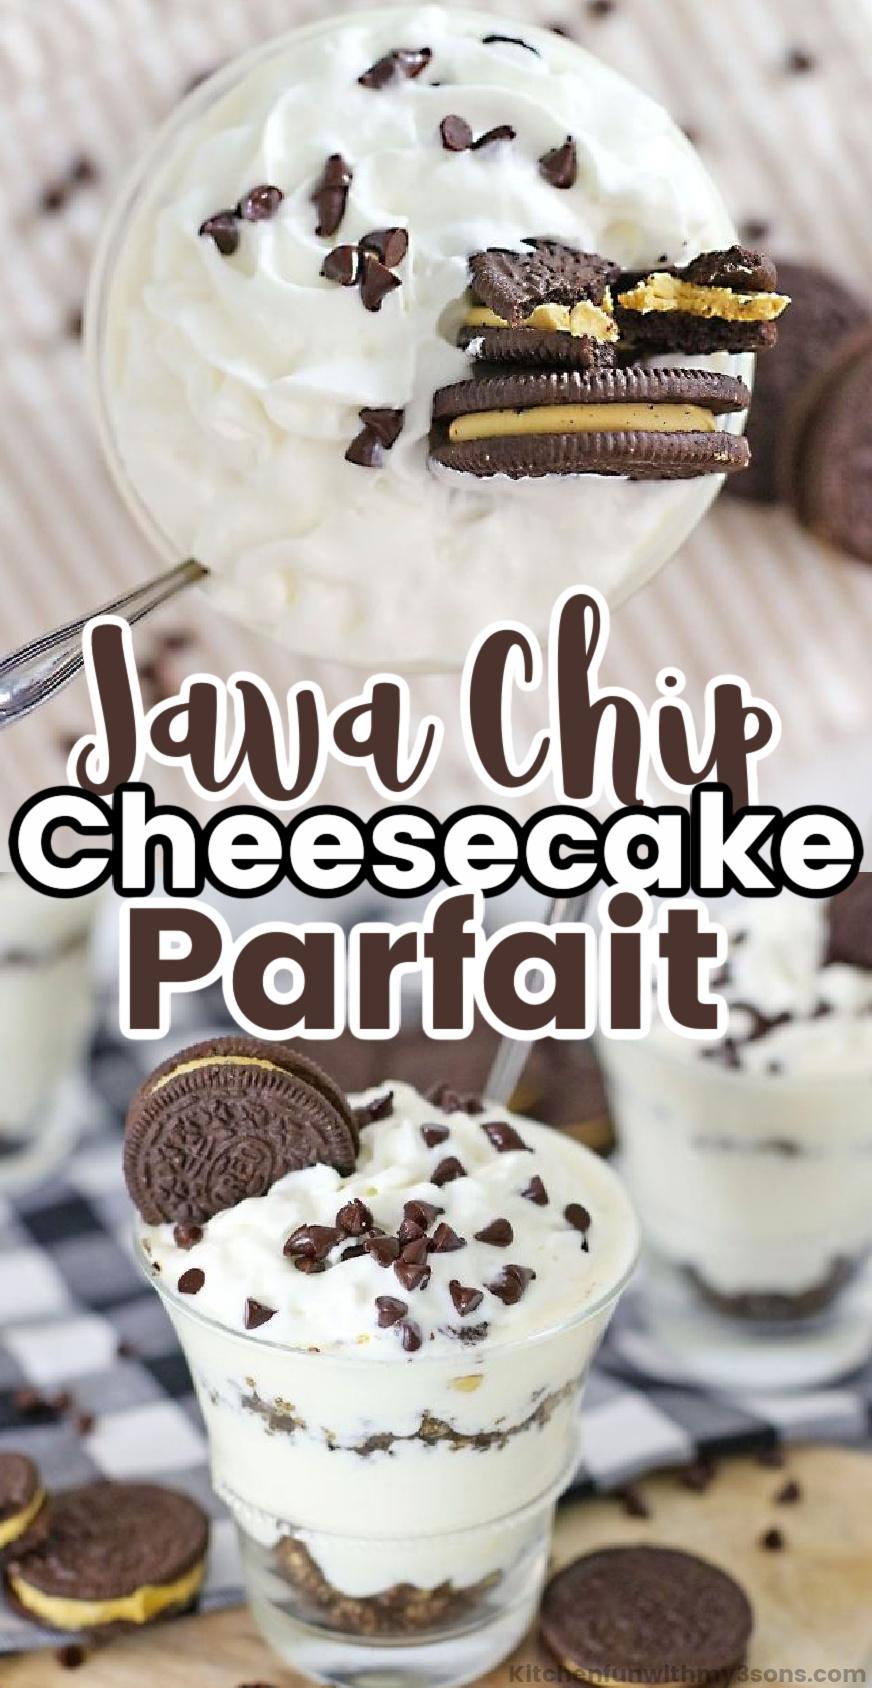 java chip cheesecake parfait